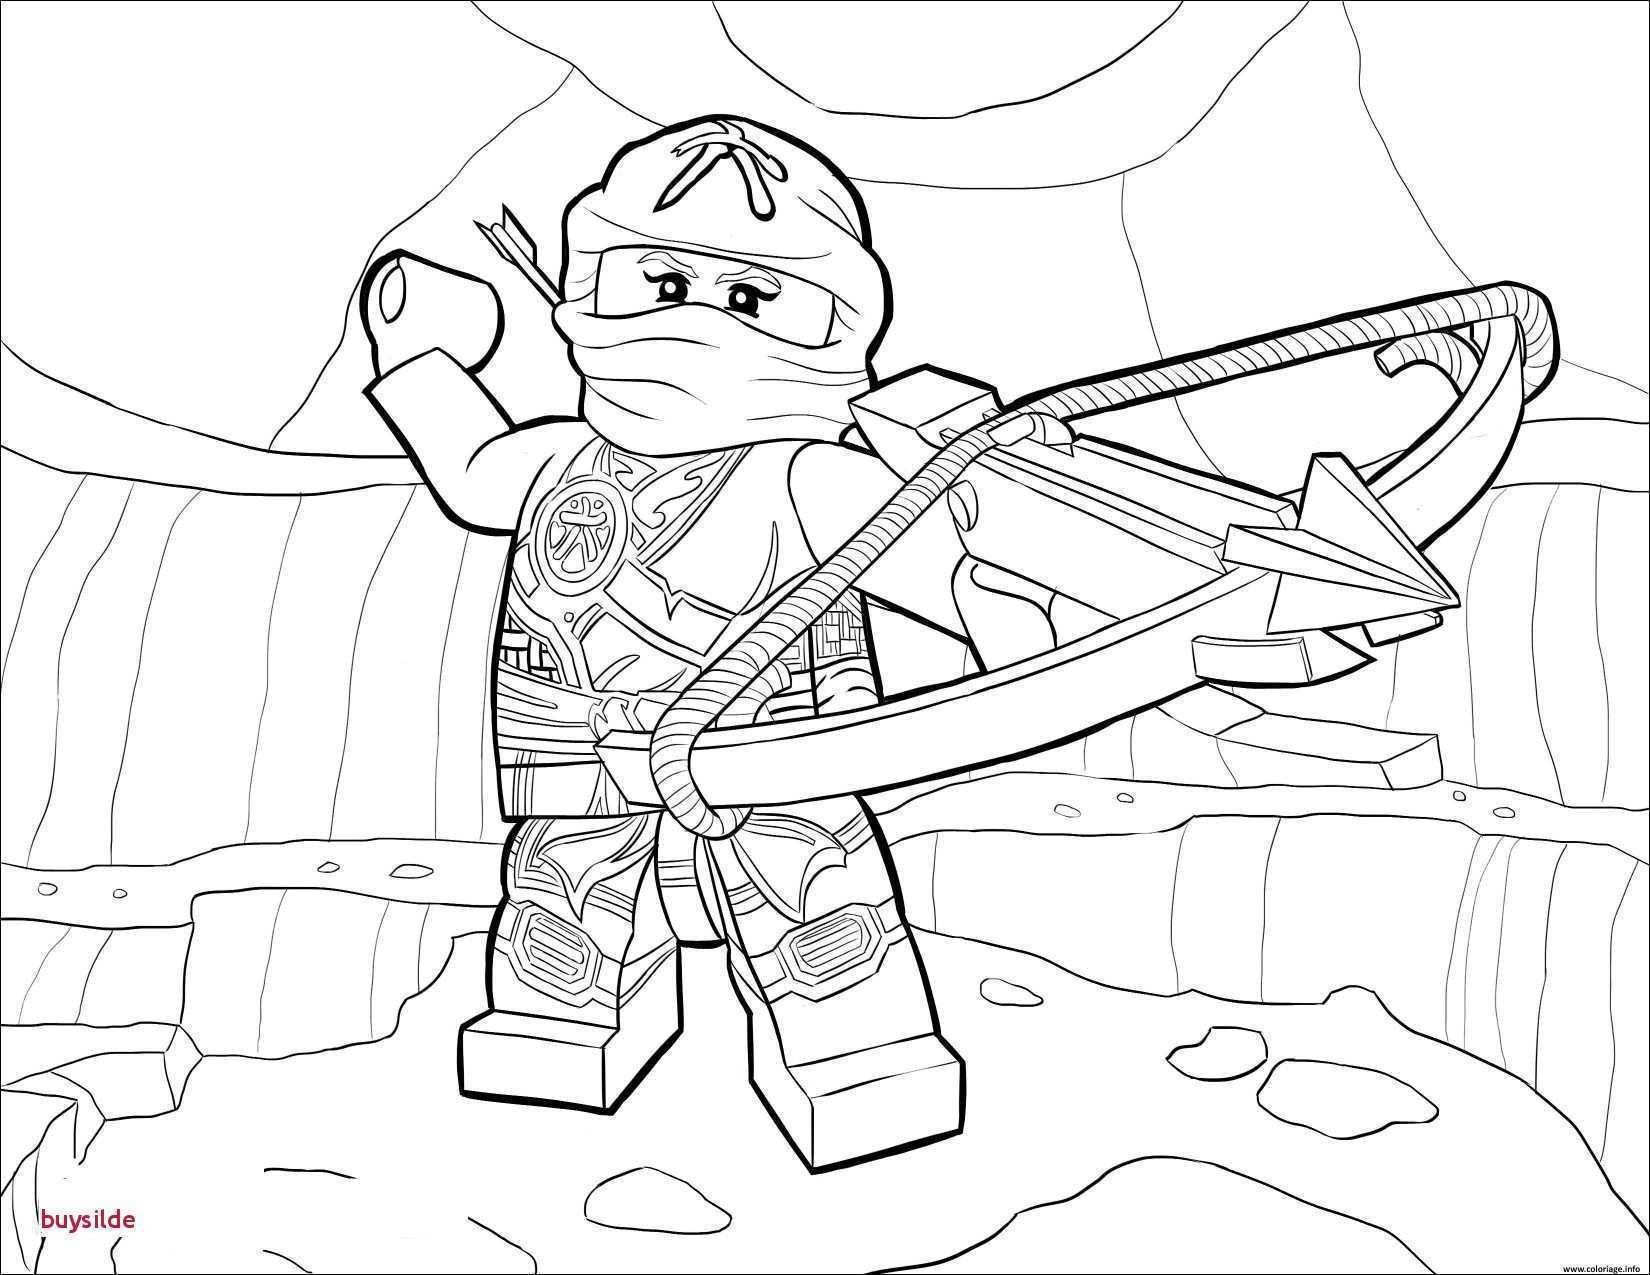 Ninja Turtle Ausmalbilder Neu Ausmalbild Ninja Turtles Bildnis Malvorlagen Igel Frisch Igel Fotografieren